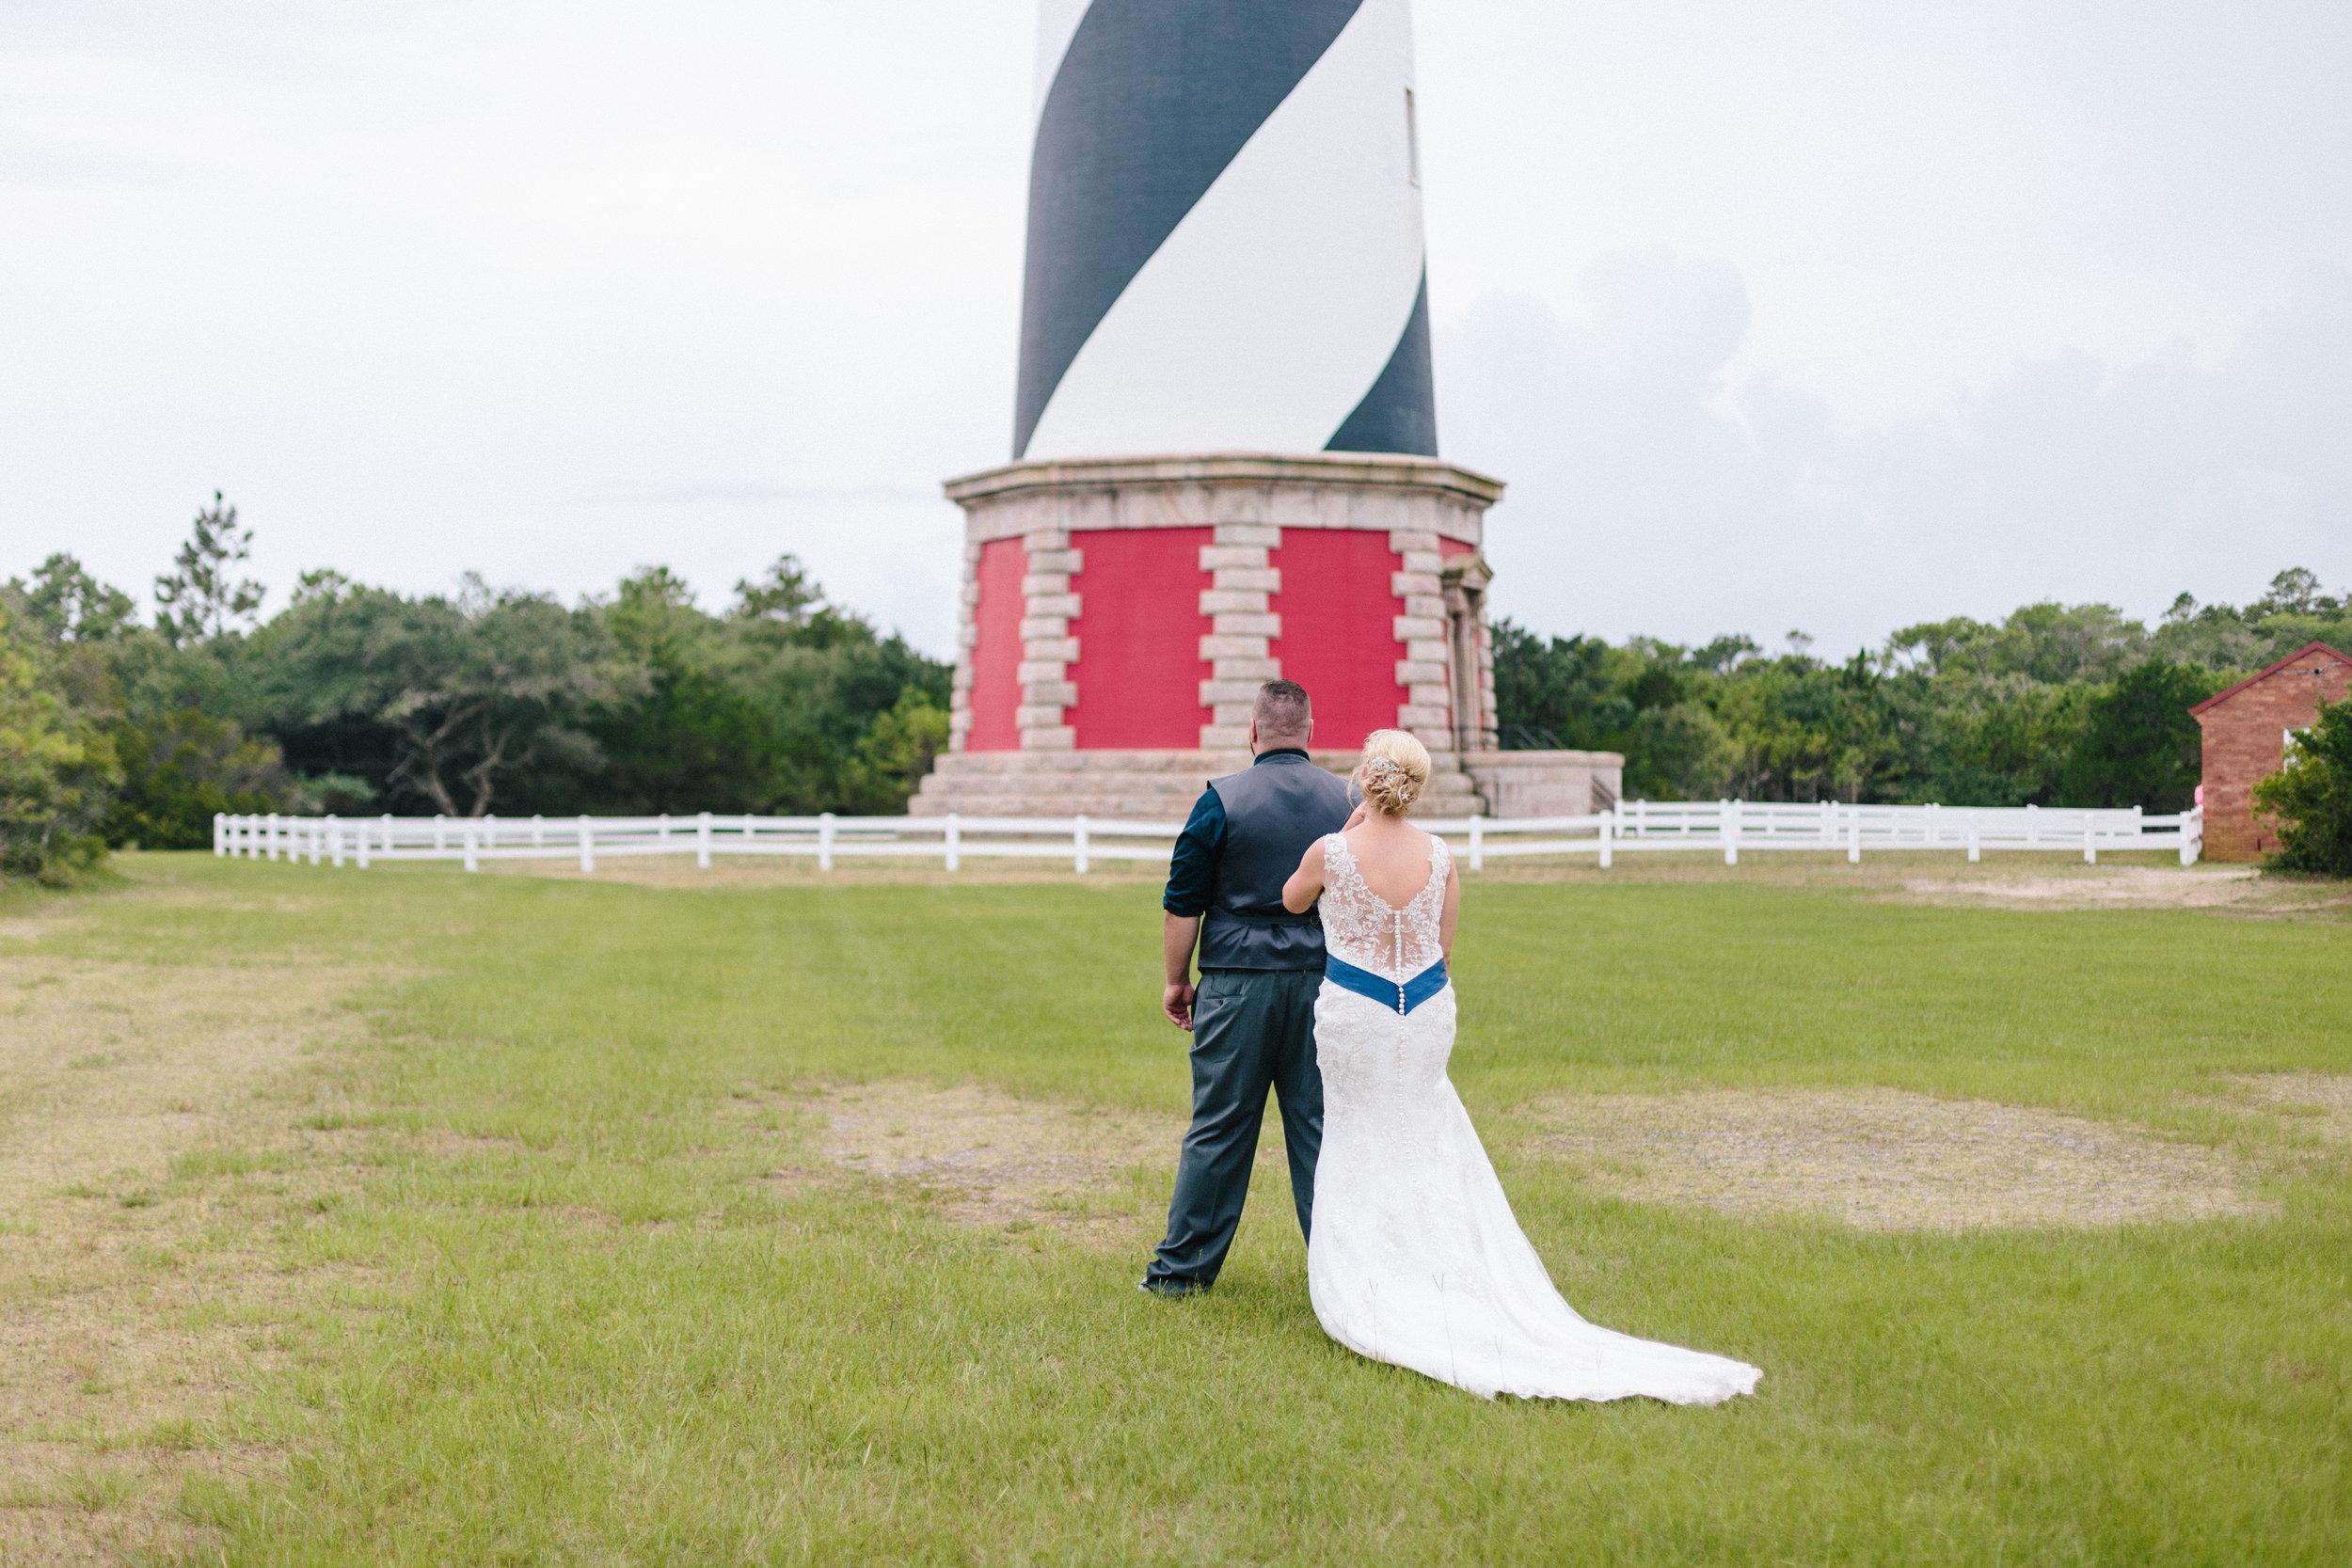 alyssa barletter photography buxton north carolina outer banks obx cape hatteras elopement intmate beach wedding-17.jpg